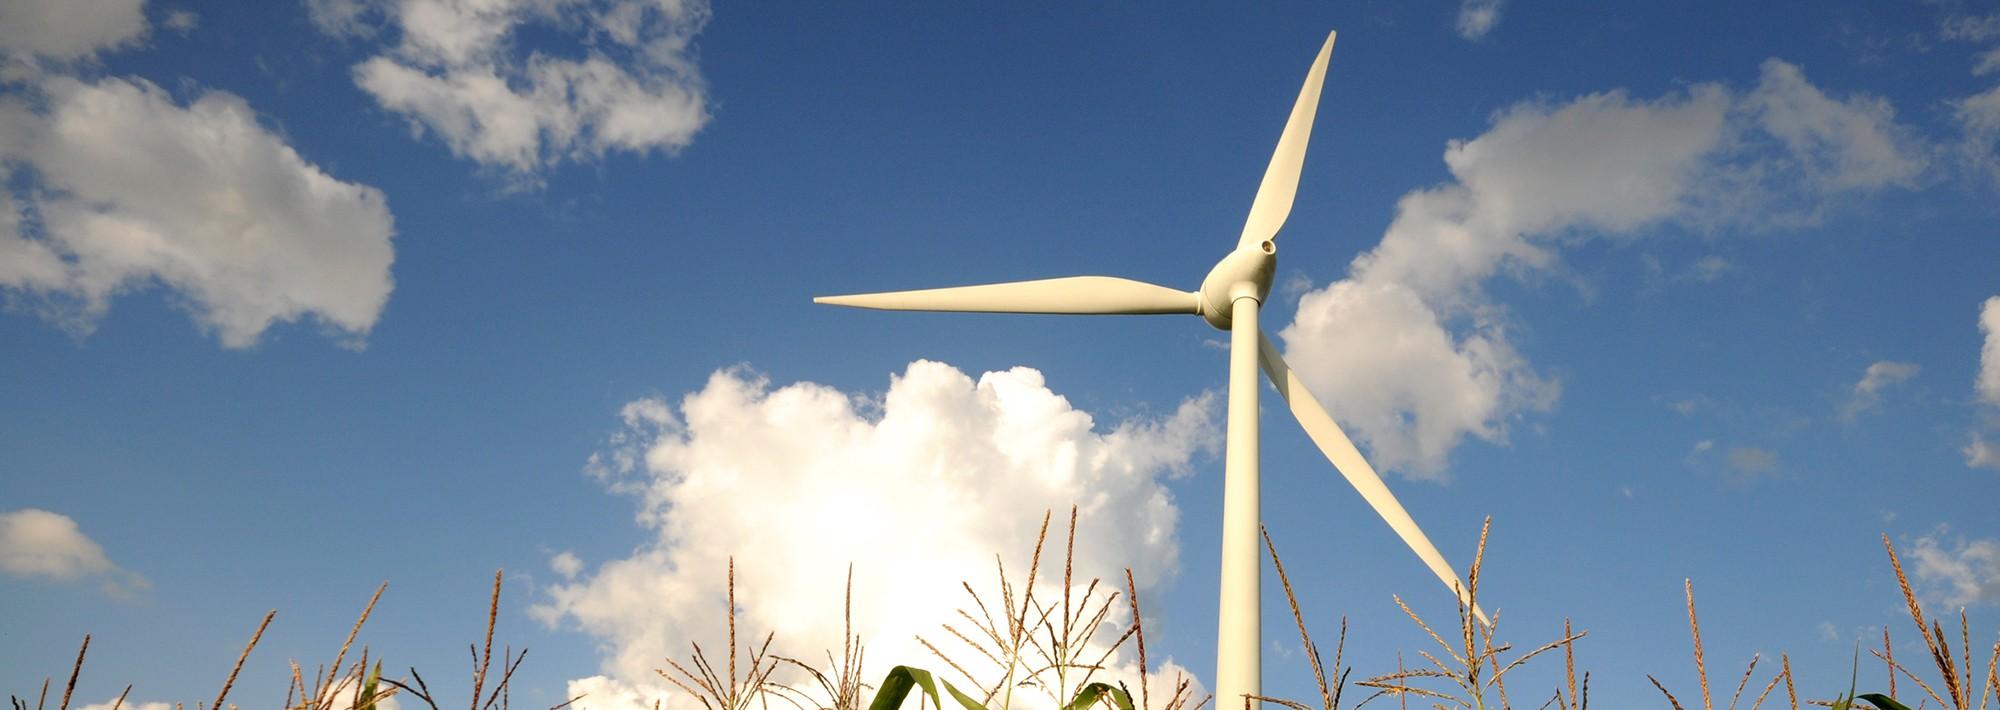 Sauerland Windkraft GmbH